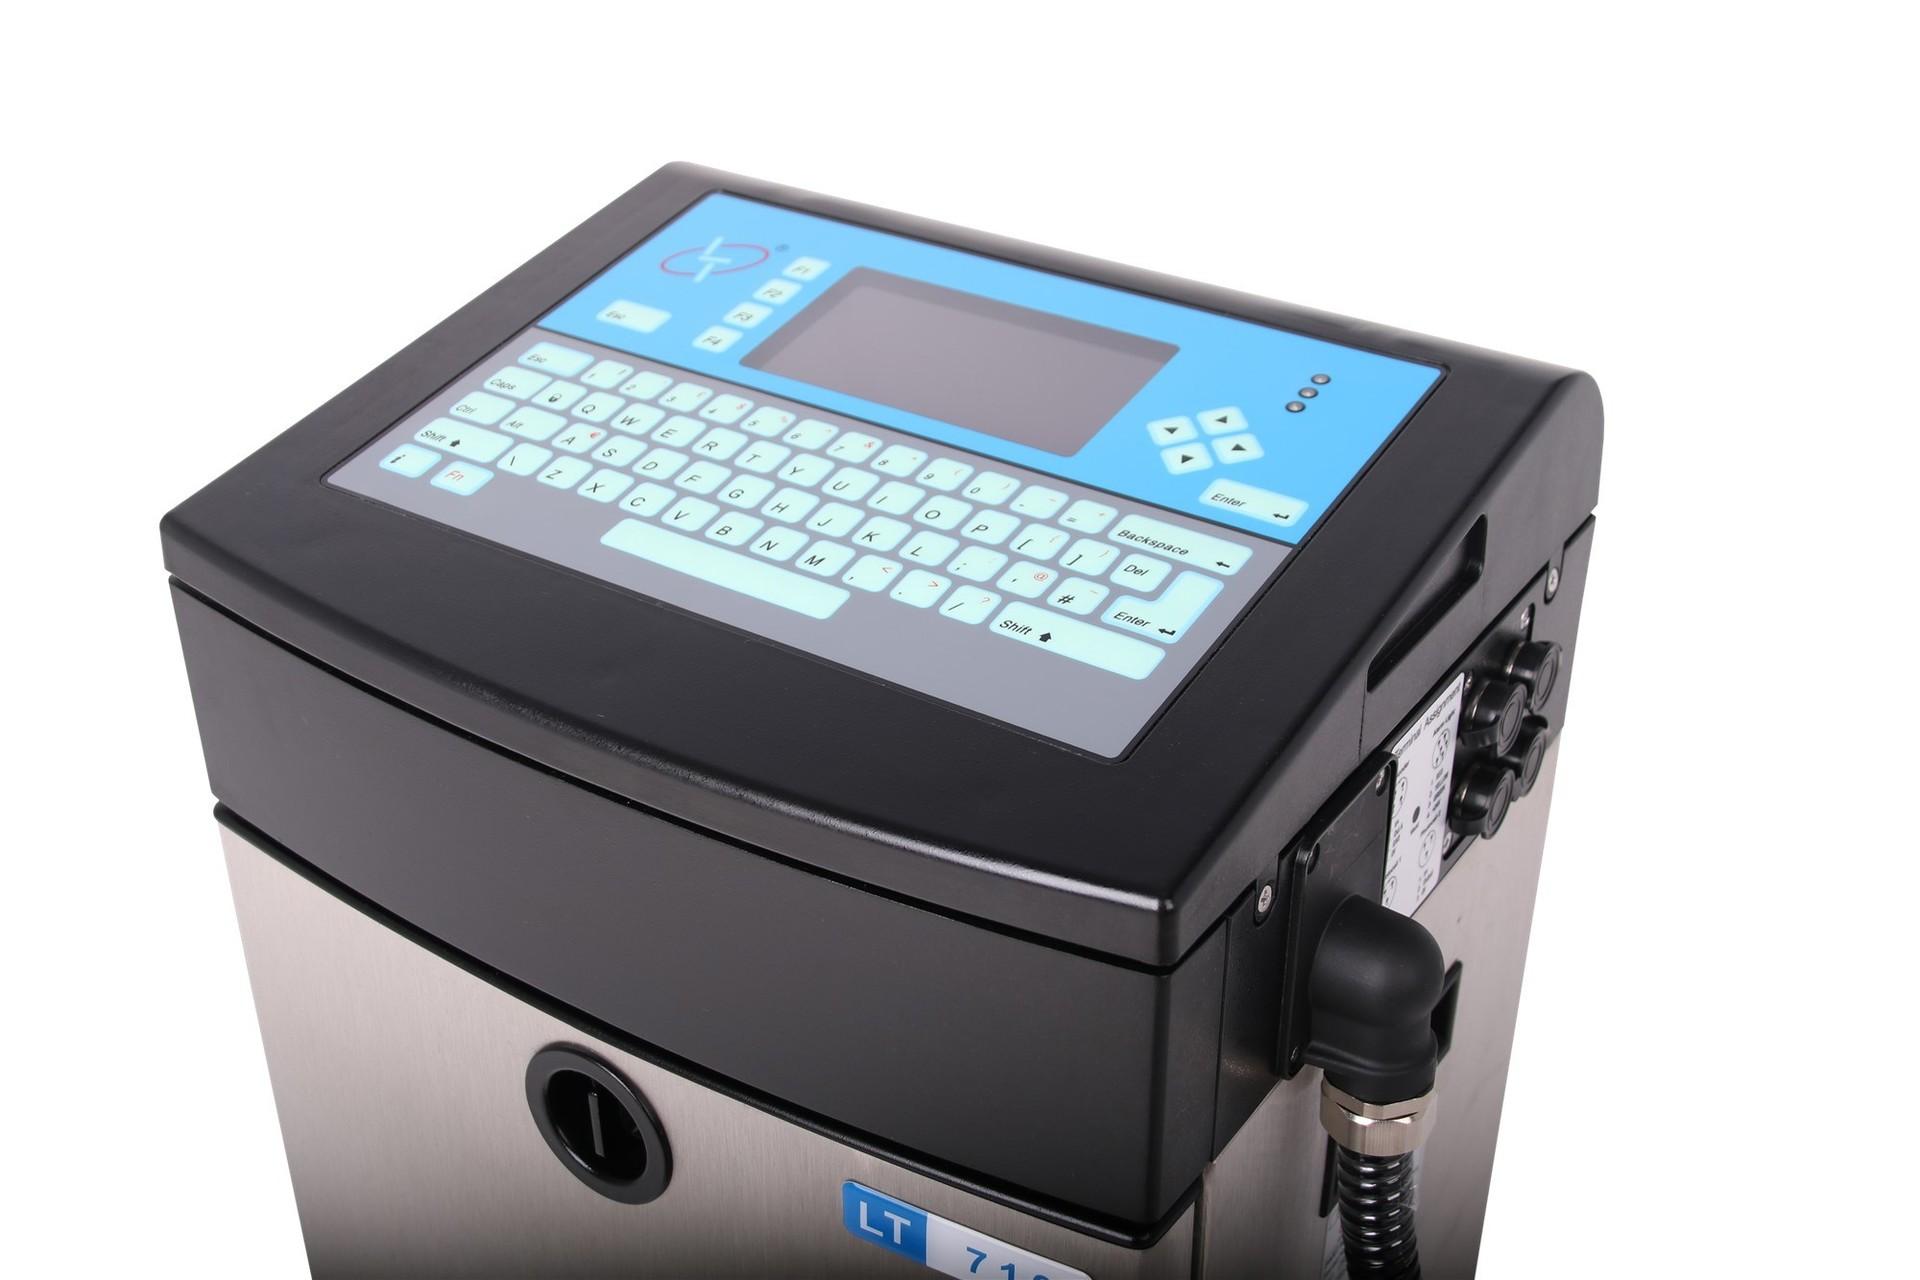 Lead Tech Lt710 Cij Inkjet Printer for Dole Can Coding